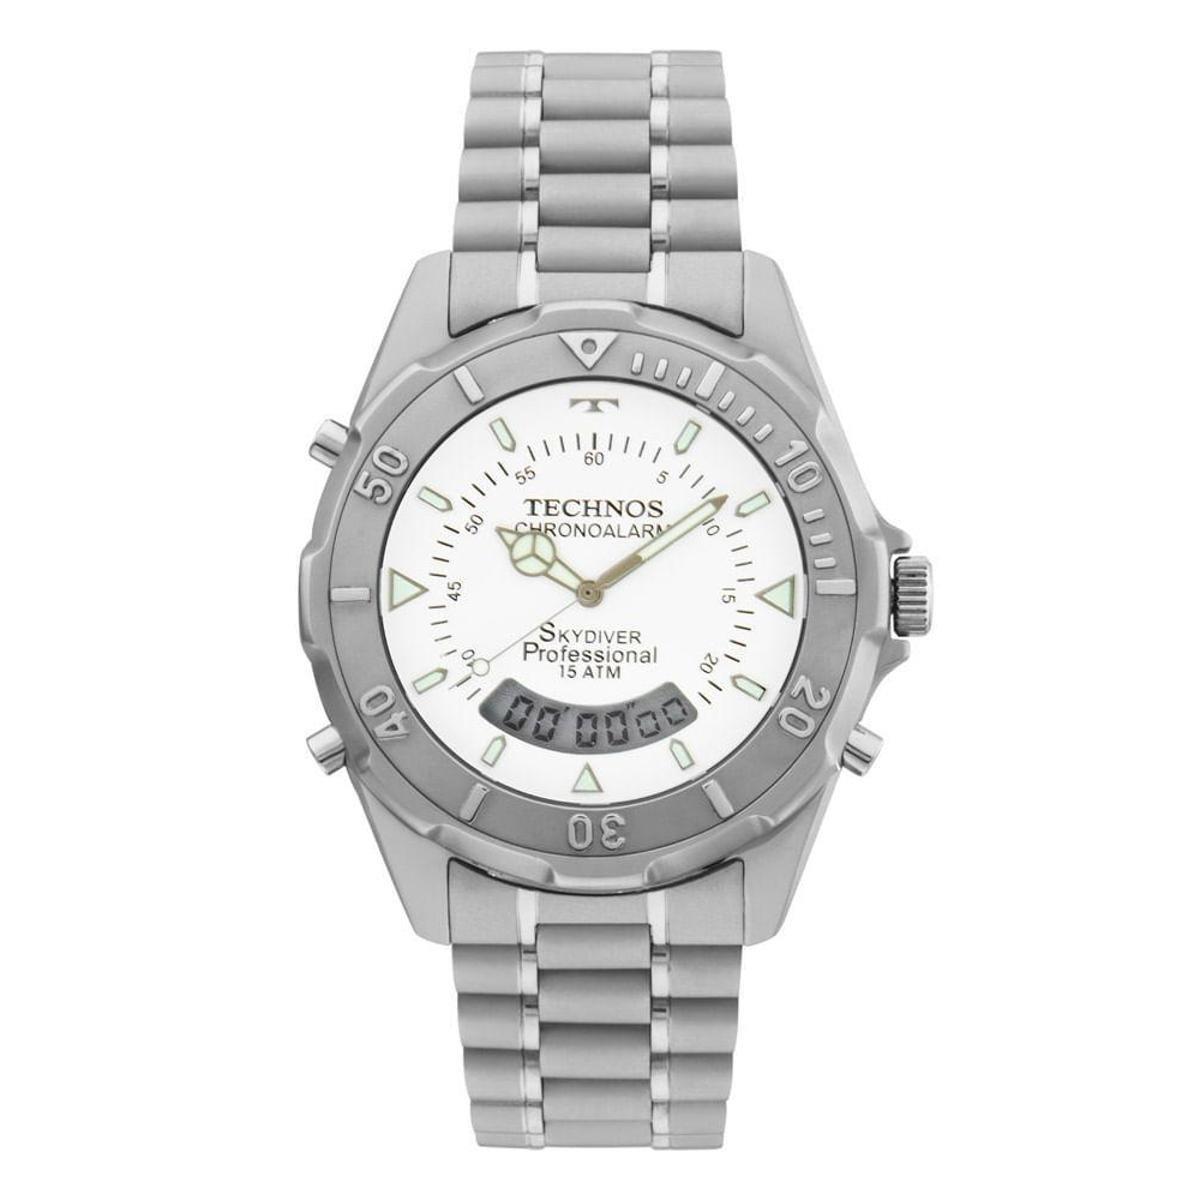 Relógio Technos Masculino Skydiver - T20562 1B T20562 1B - Prata ... 69db576cac